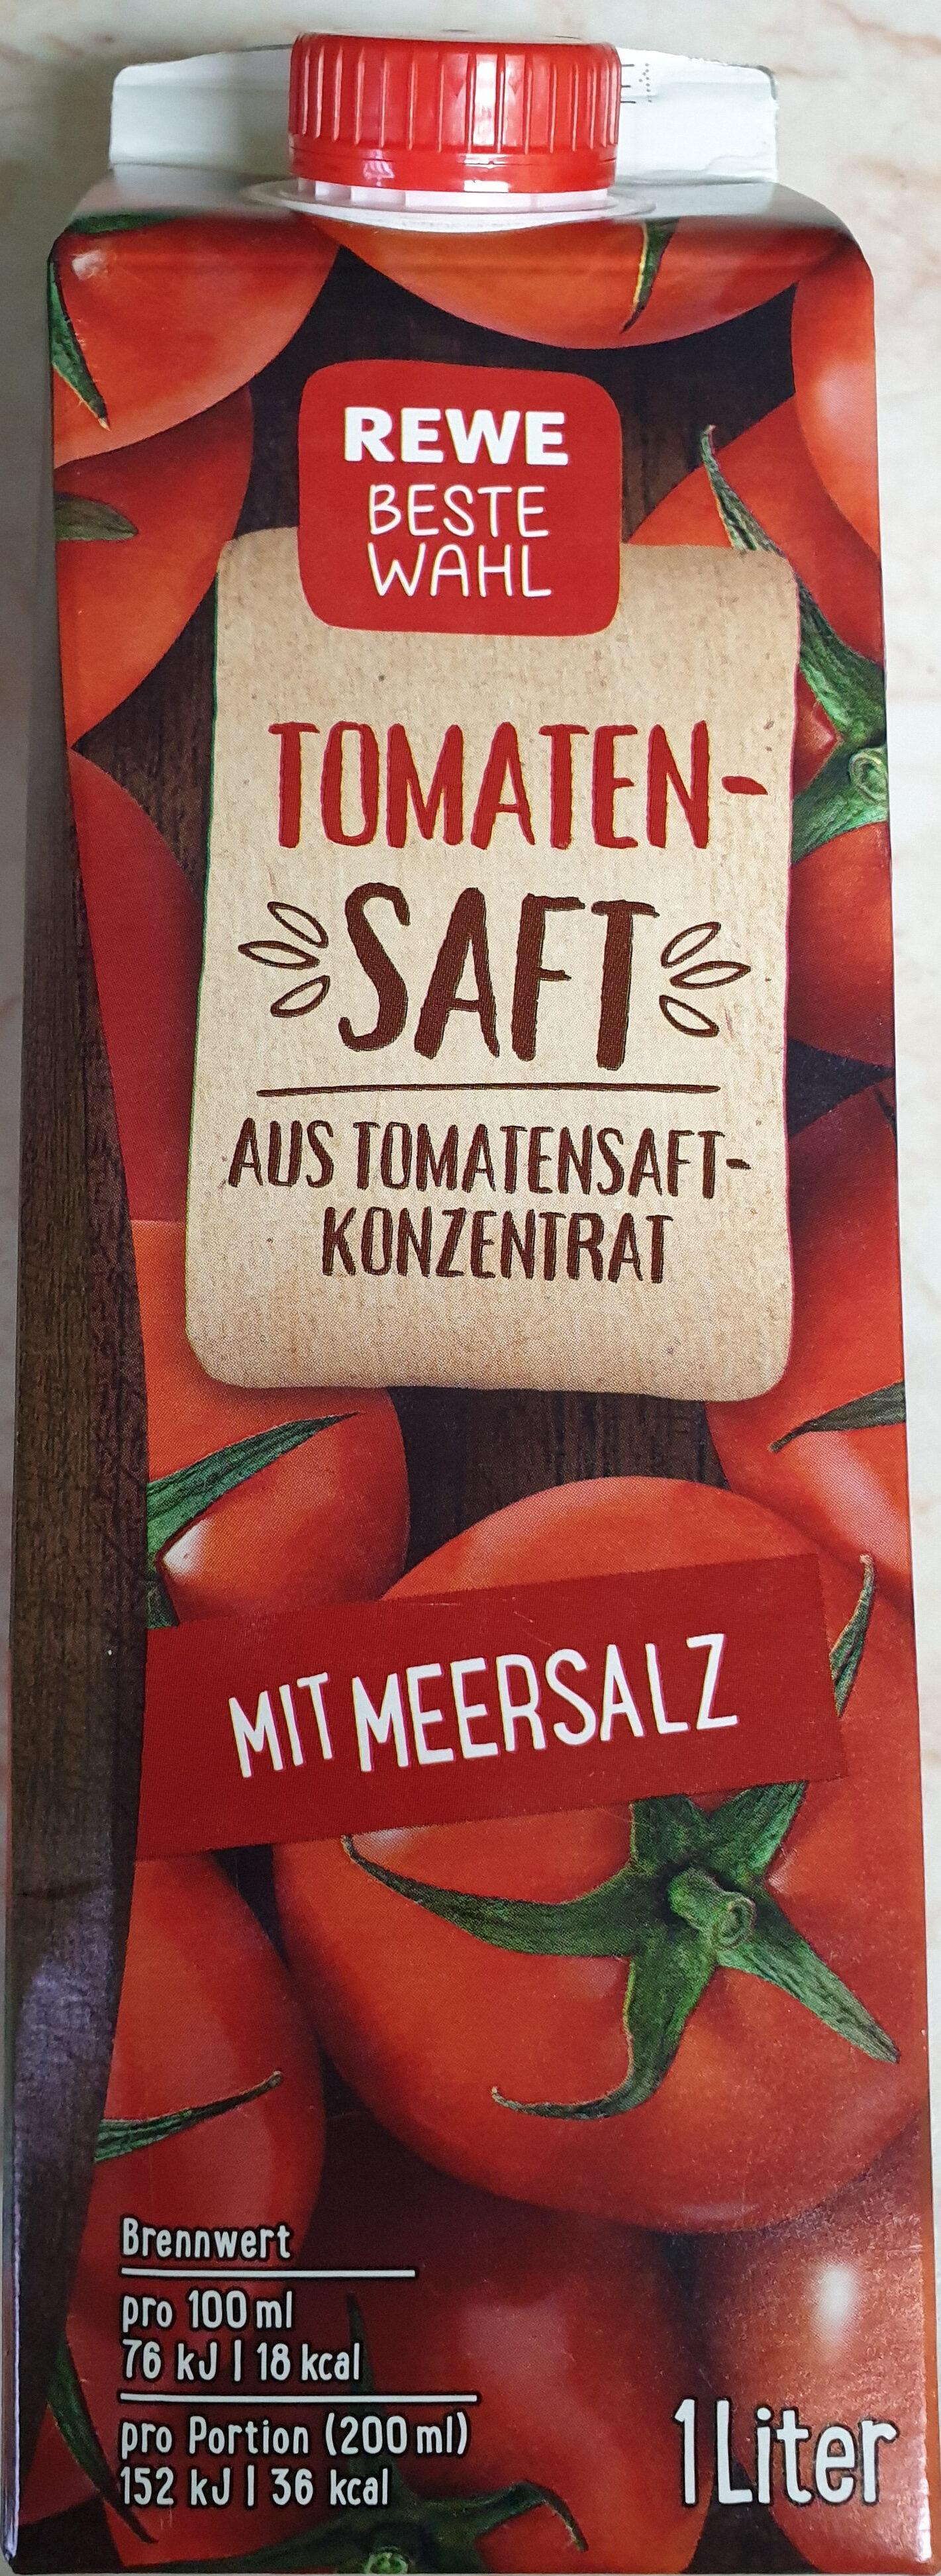 Tomatensaft - Produkt - de